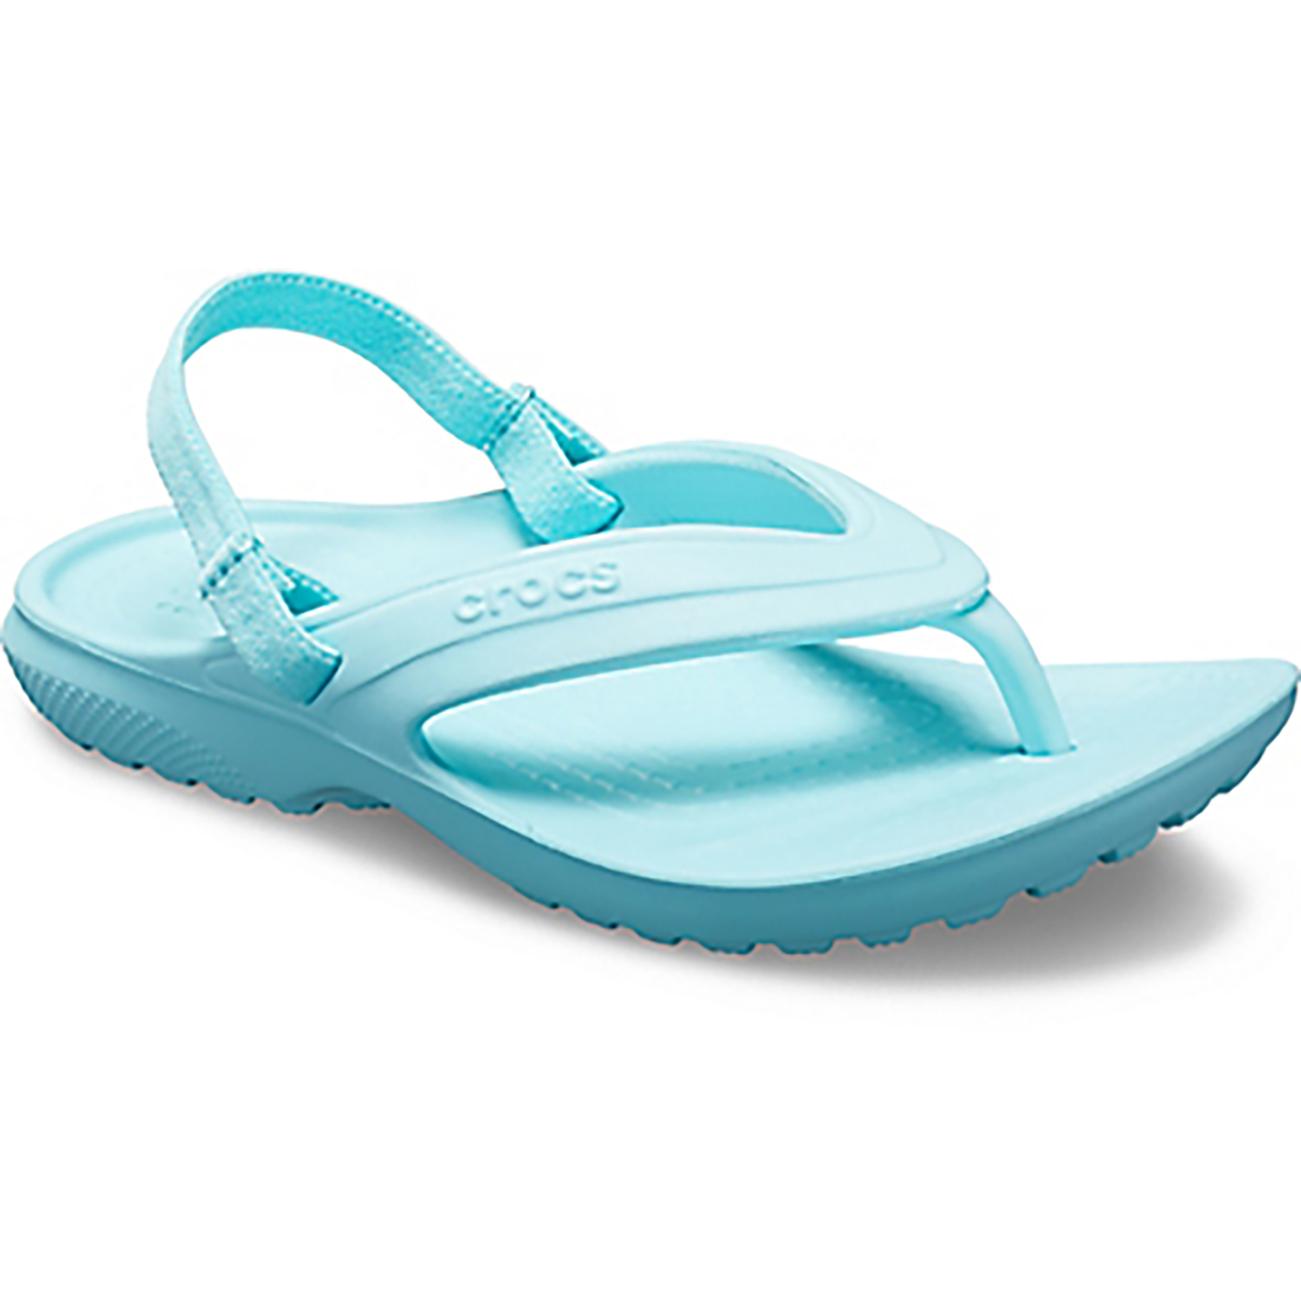 Unisex Kids Crocs Classic Flip K Summer Pool Sea Rubber Shower Sandals All Sizes